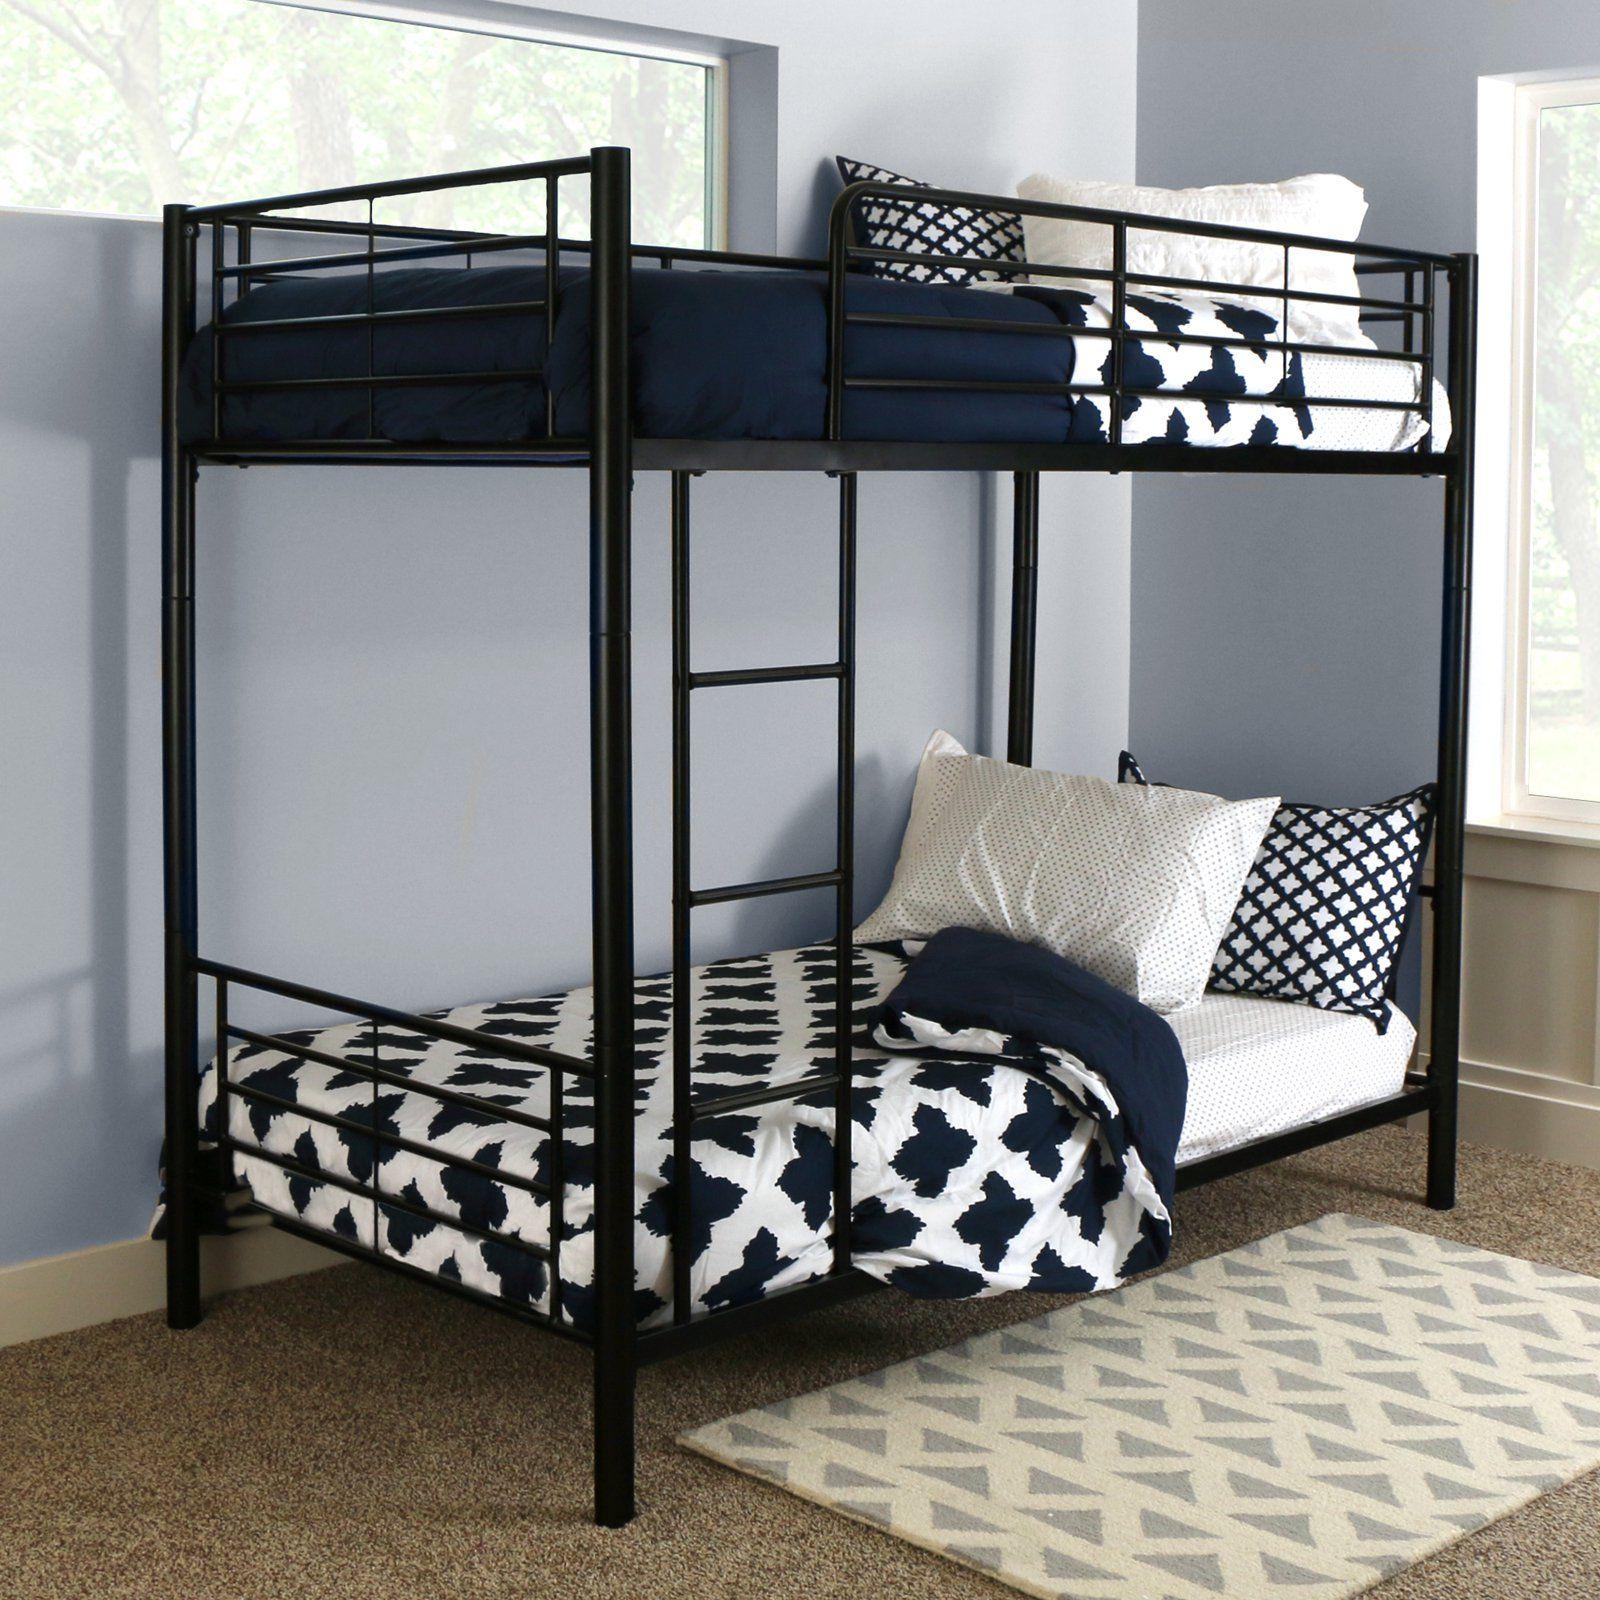 Black Metal Twin Over Twin Bunk Beds Kids Convertible Frame Bedroom Furniture